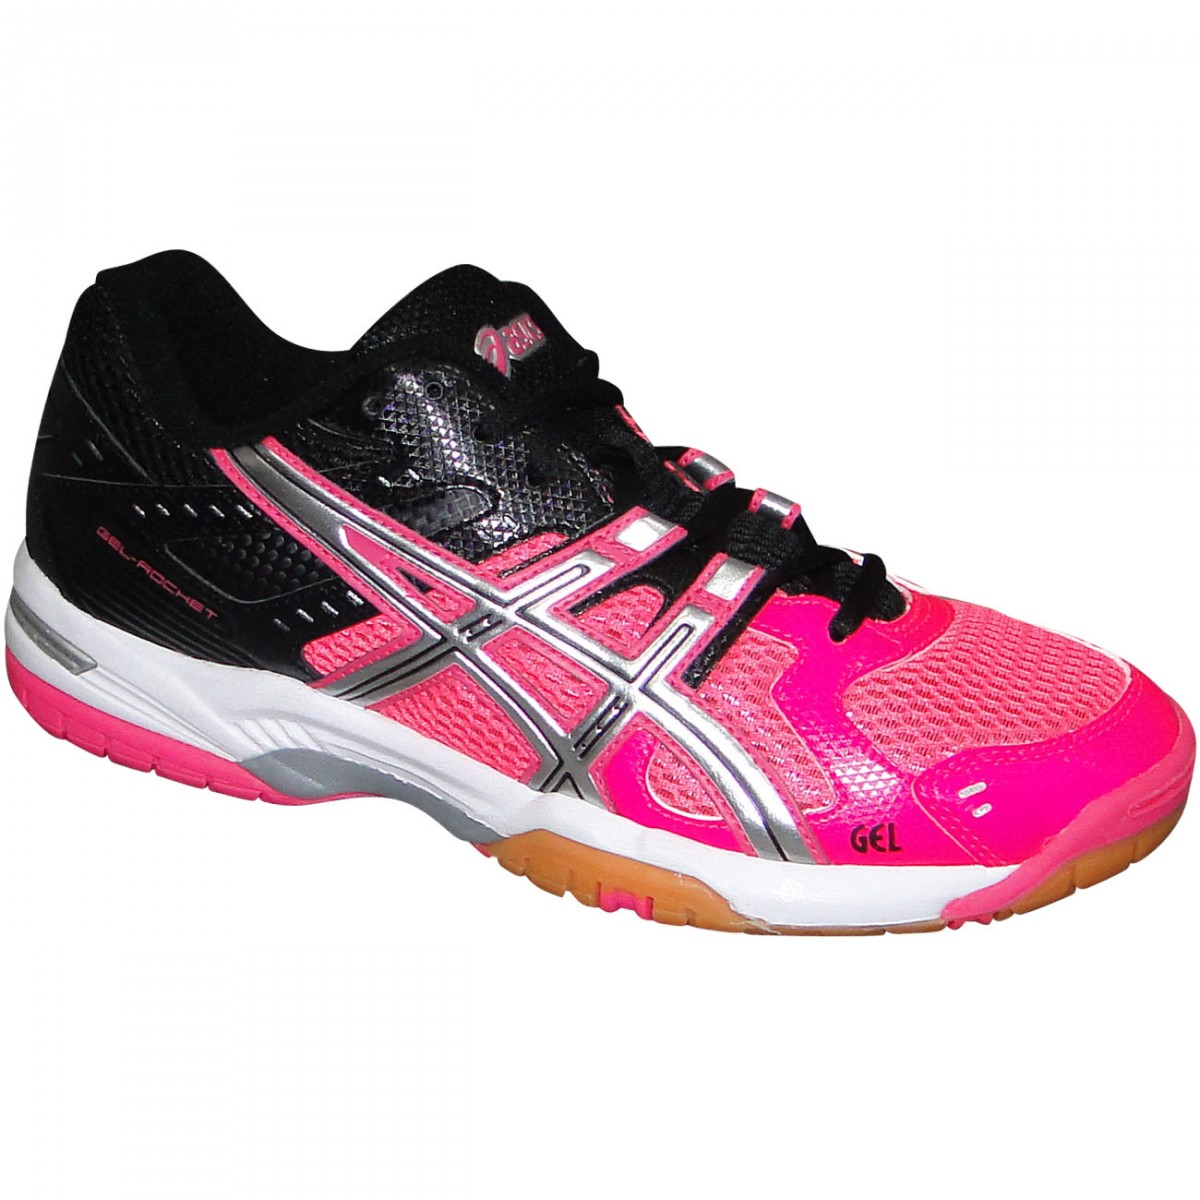 Tenis Asics Gel-Rocket 6 B257N 2193 - Pink Preto Branco - Chuteira ... 13249d7821eef